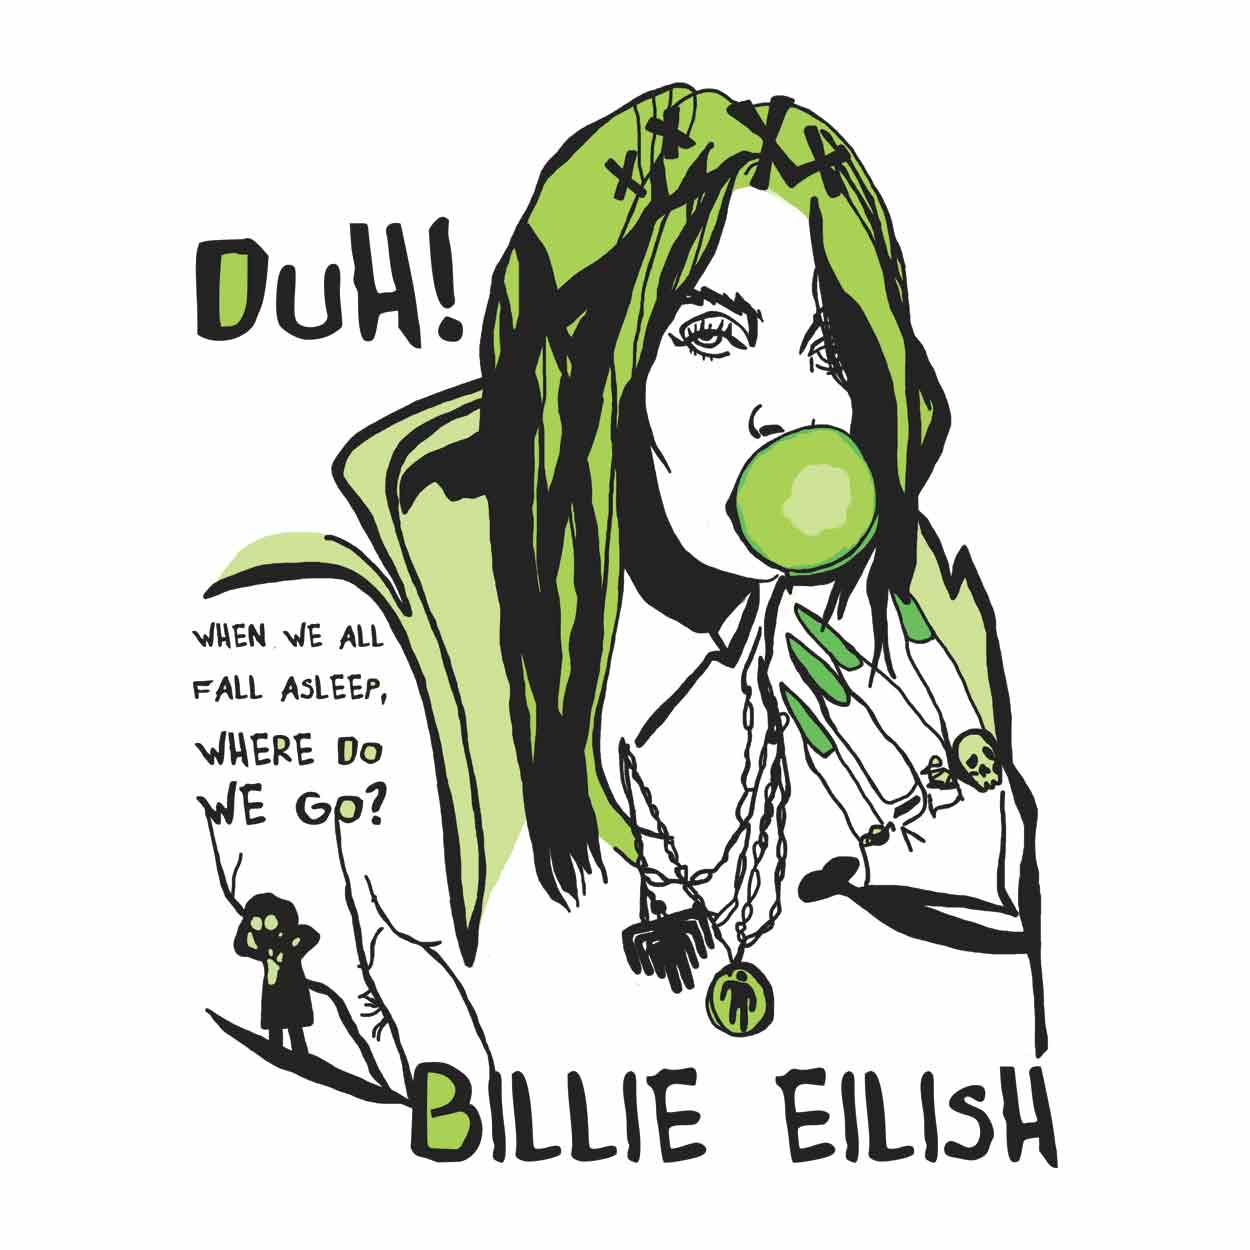 Camiseta - When We All Fall Asleep, Where Do We Go? - Billie Eilish - Masculino